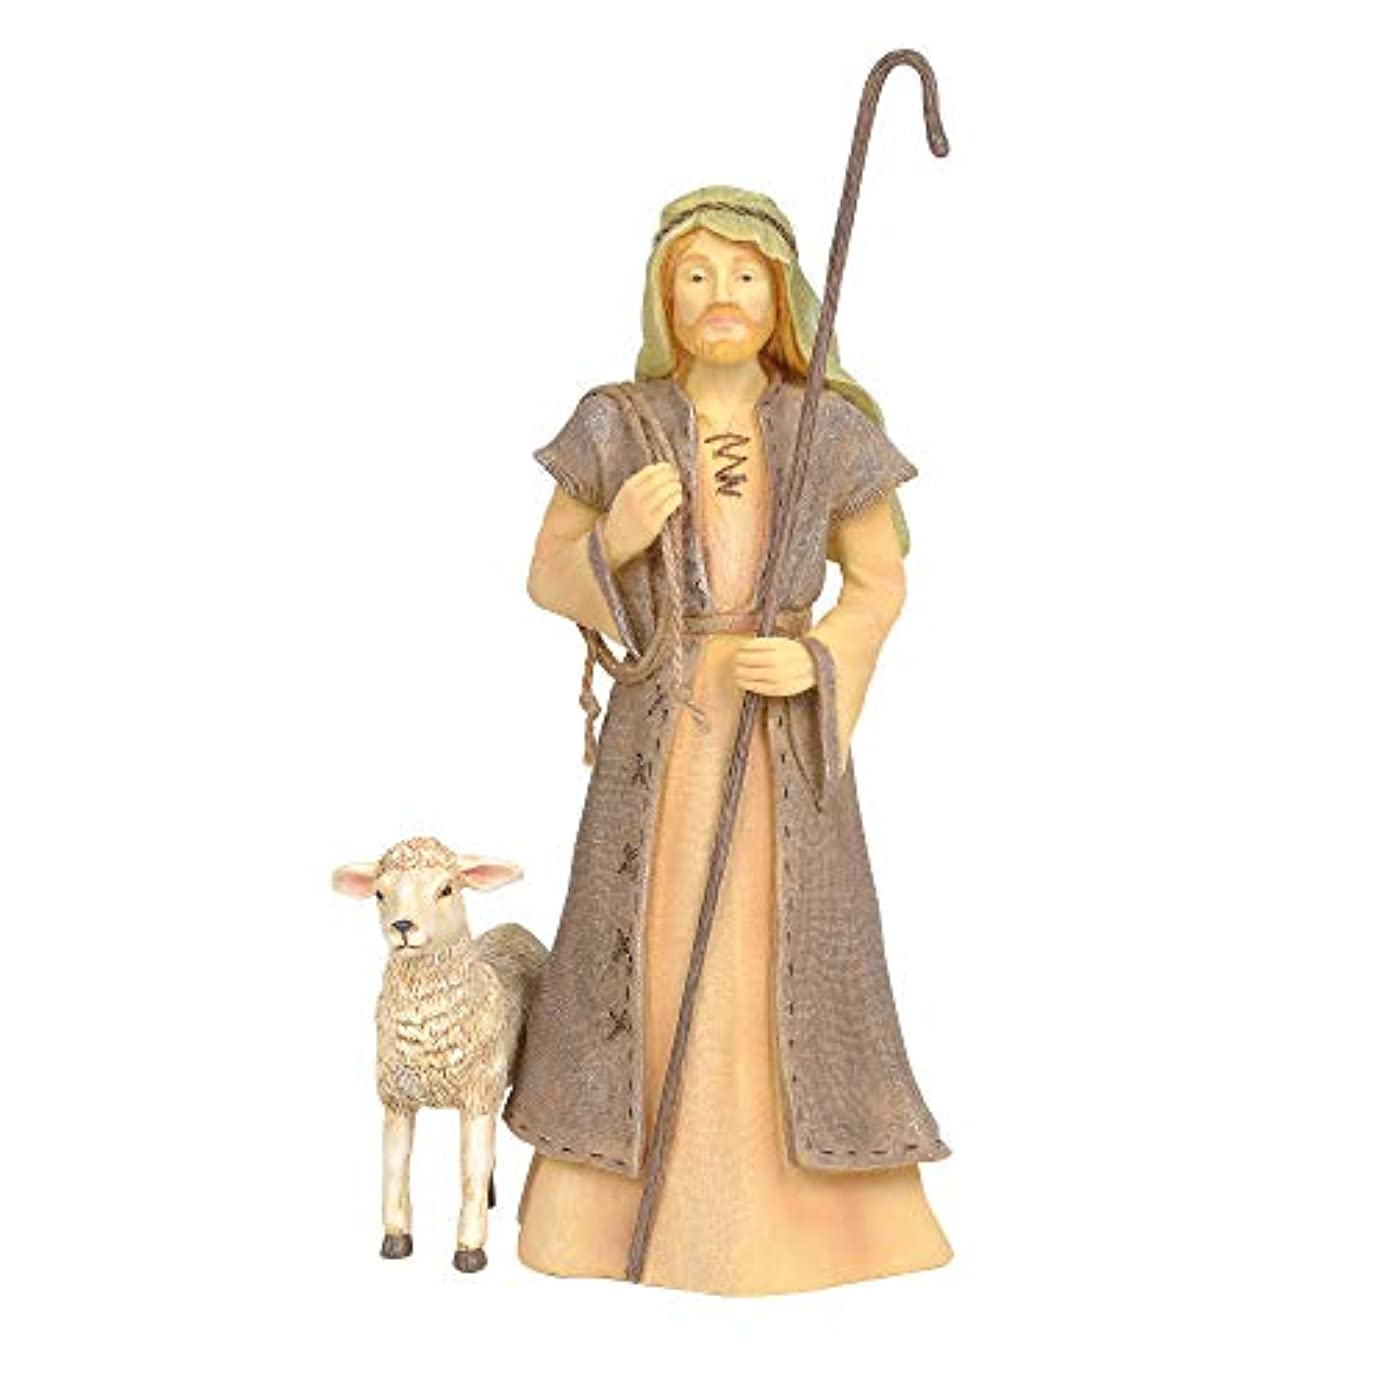 Enesco Foundations Nativity Shepherd Figure, 10.5